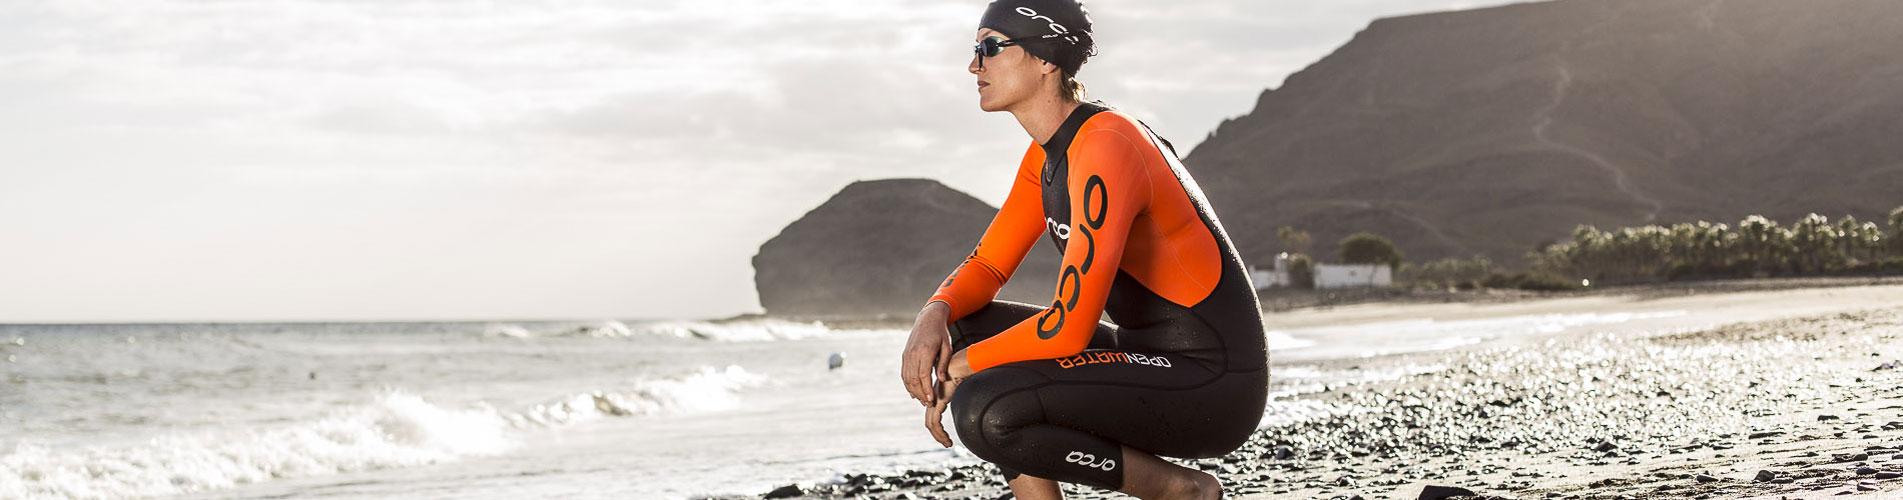 Orca Open Water Wetsuit